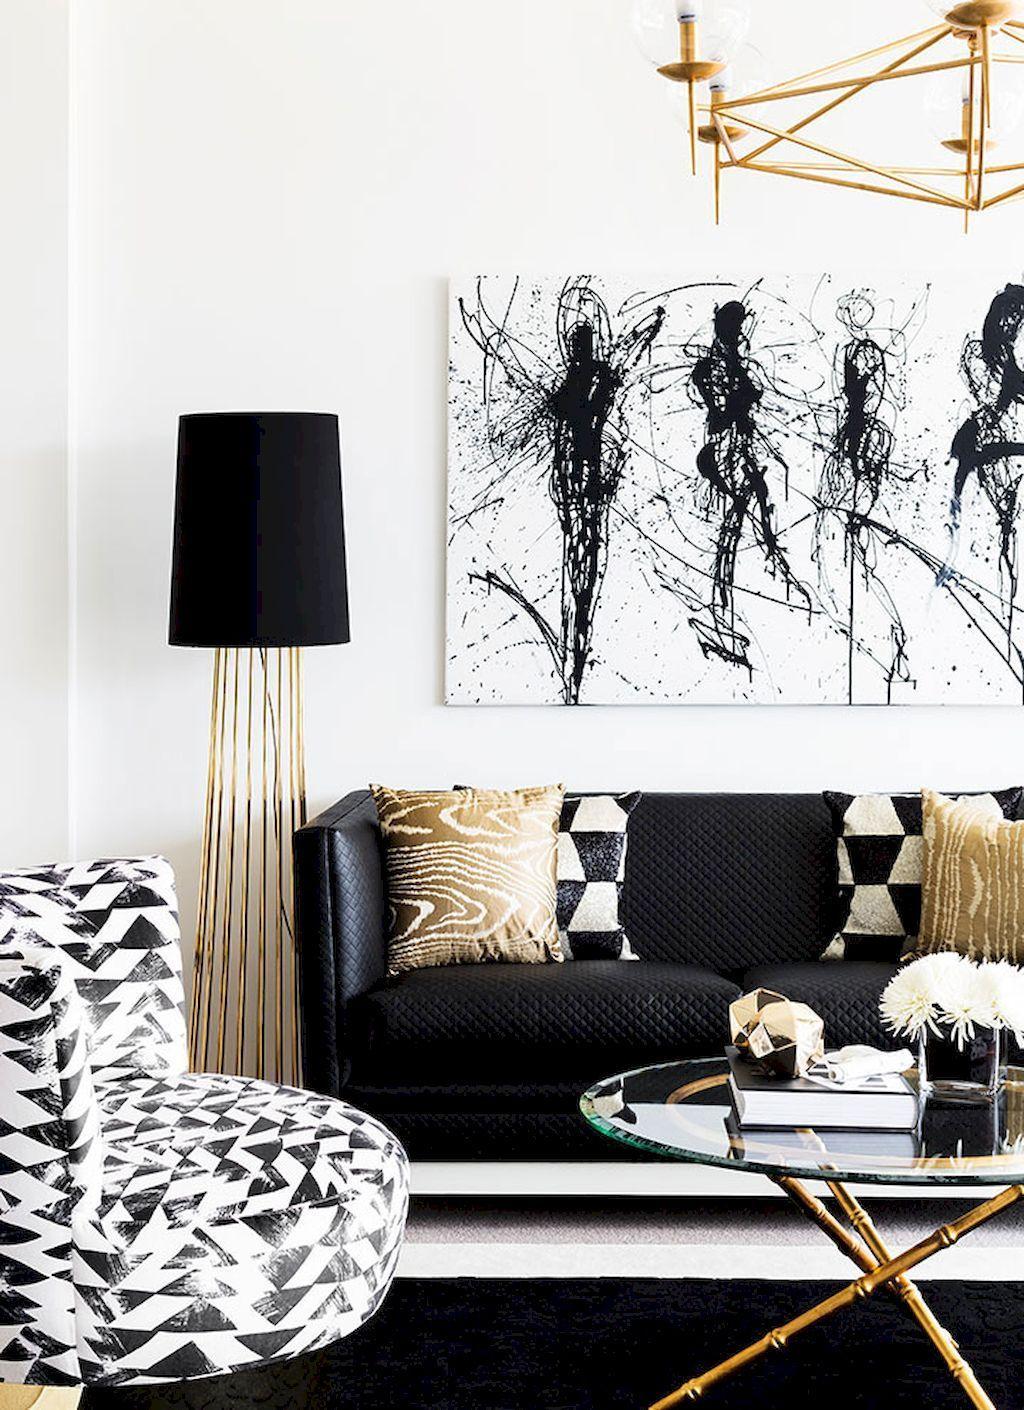 english garden indoor garden living room decor classy on beautiful modern black white living room inspired id=26866